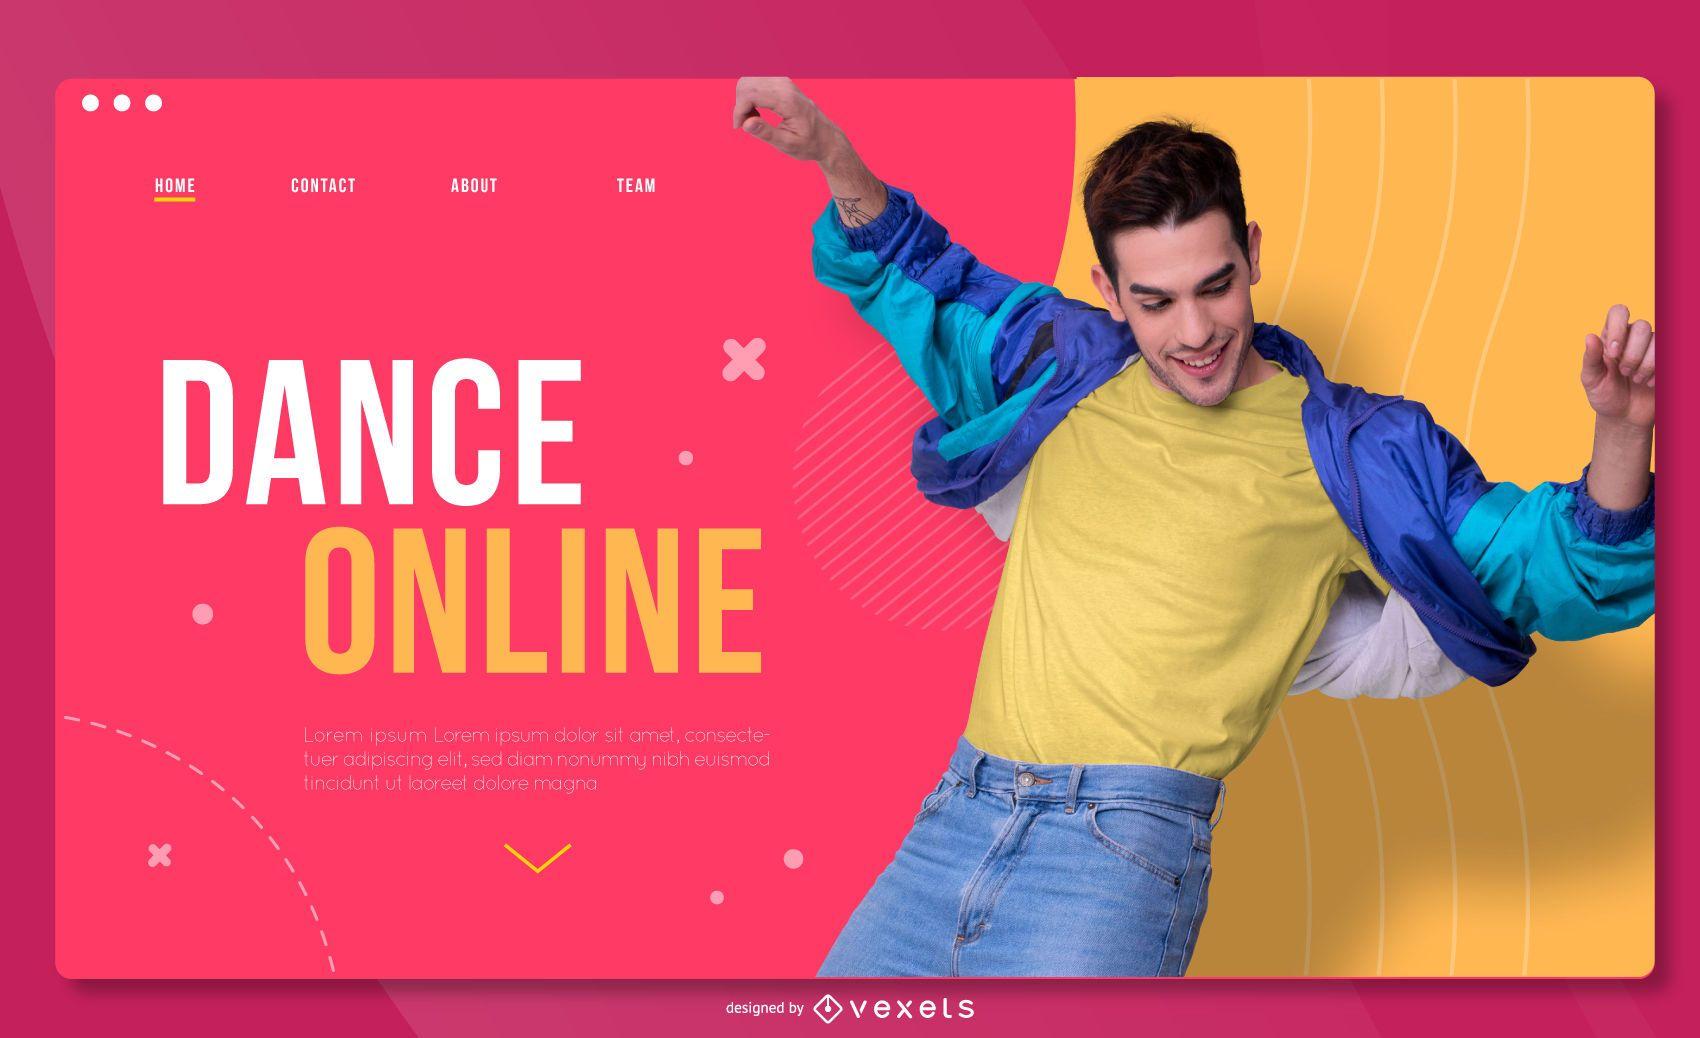 Dancing online landing page template